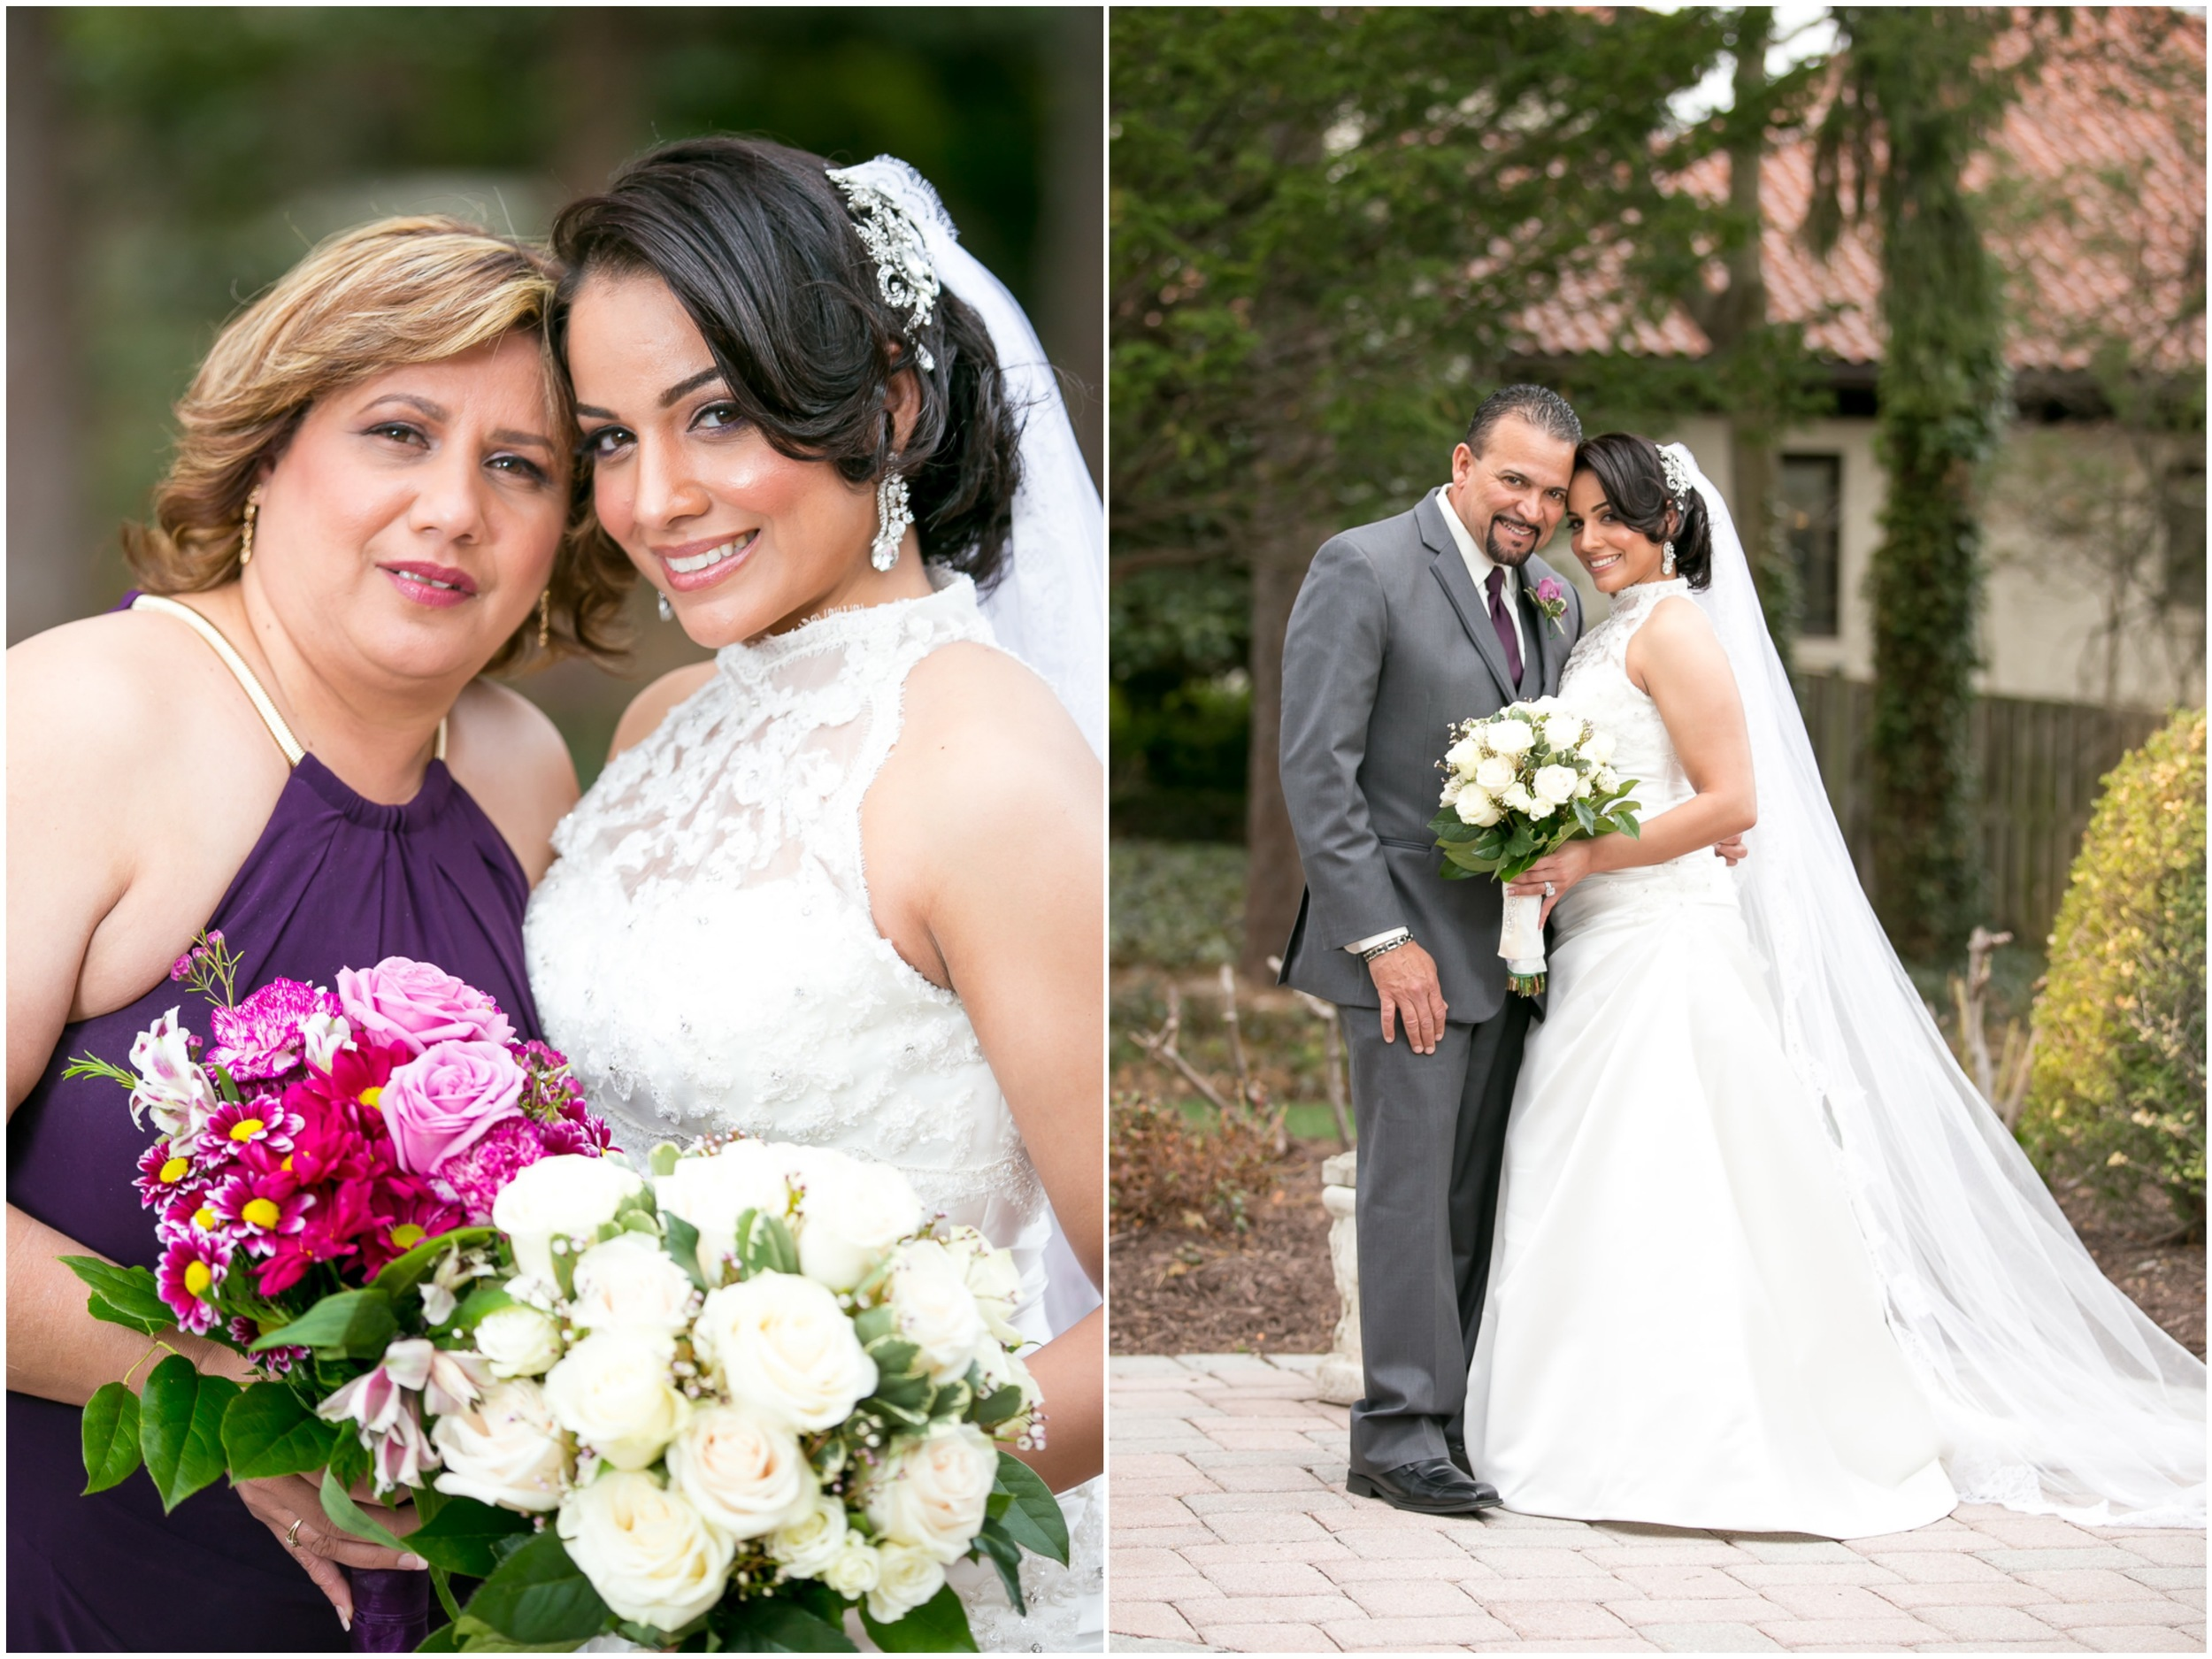 Bradly-and-Jesenia-Wedding-Collage-21.jpg